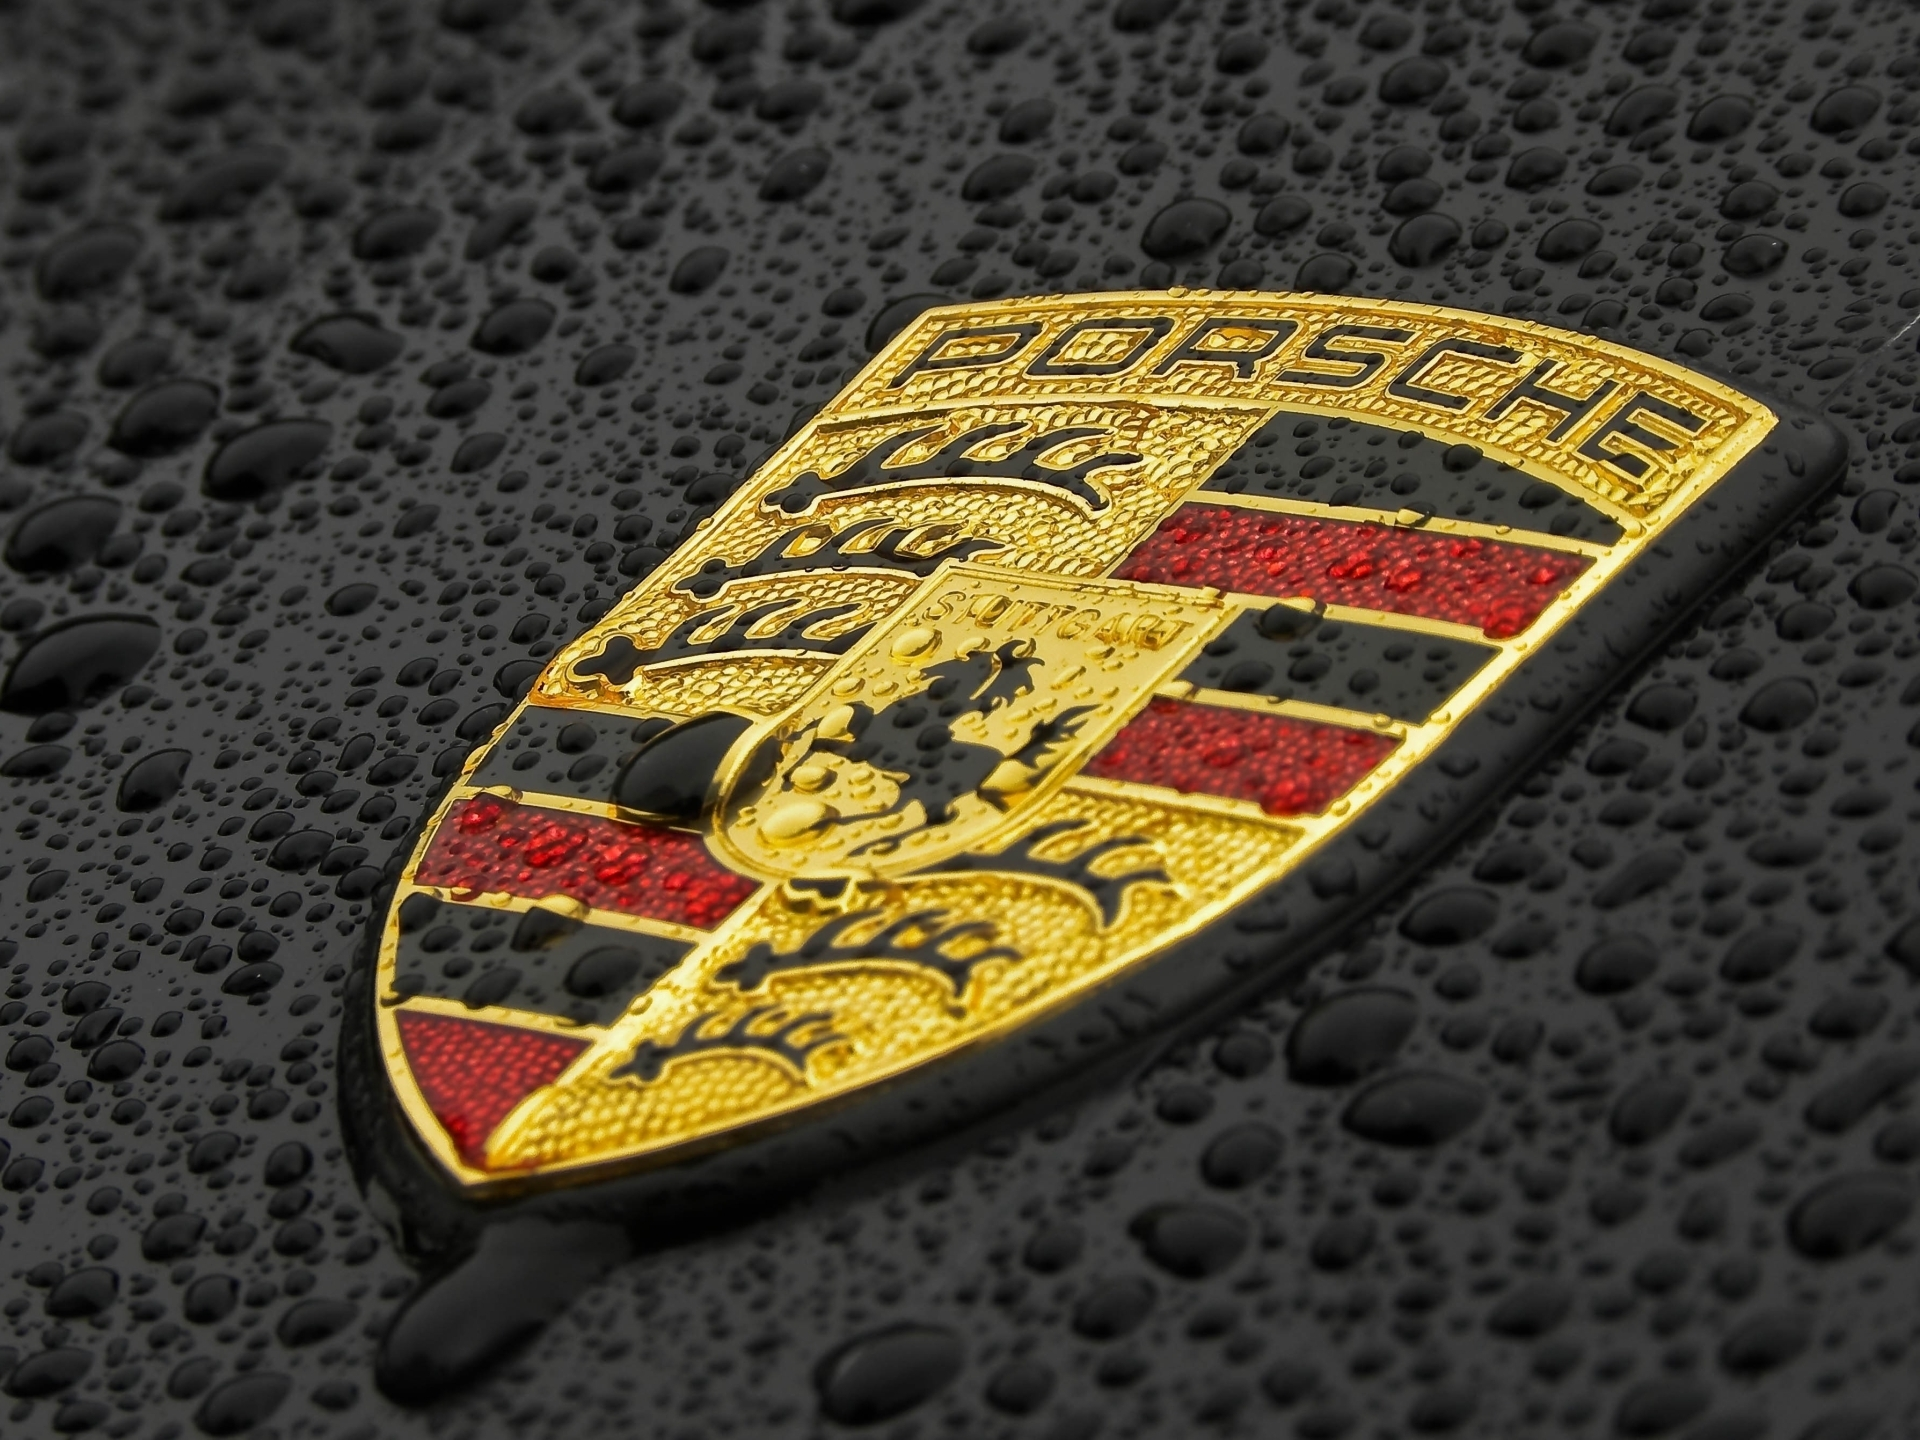 Porsche Logo Wallpapers Pictures Images 1920x1440